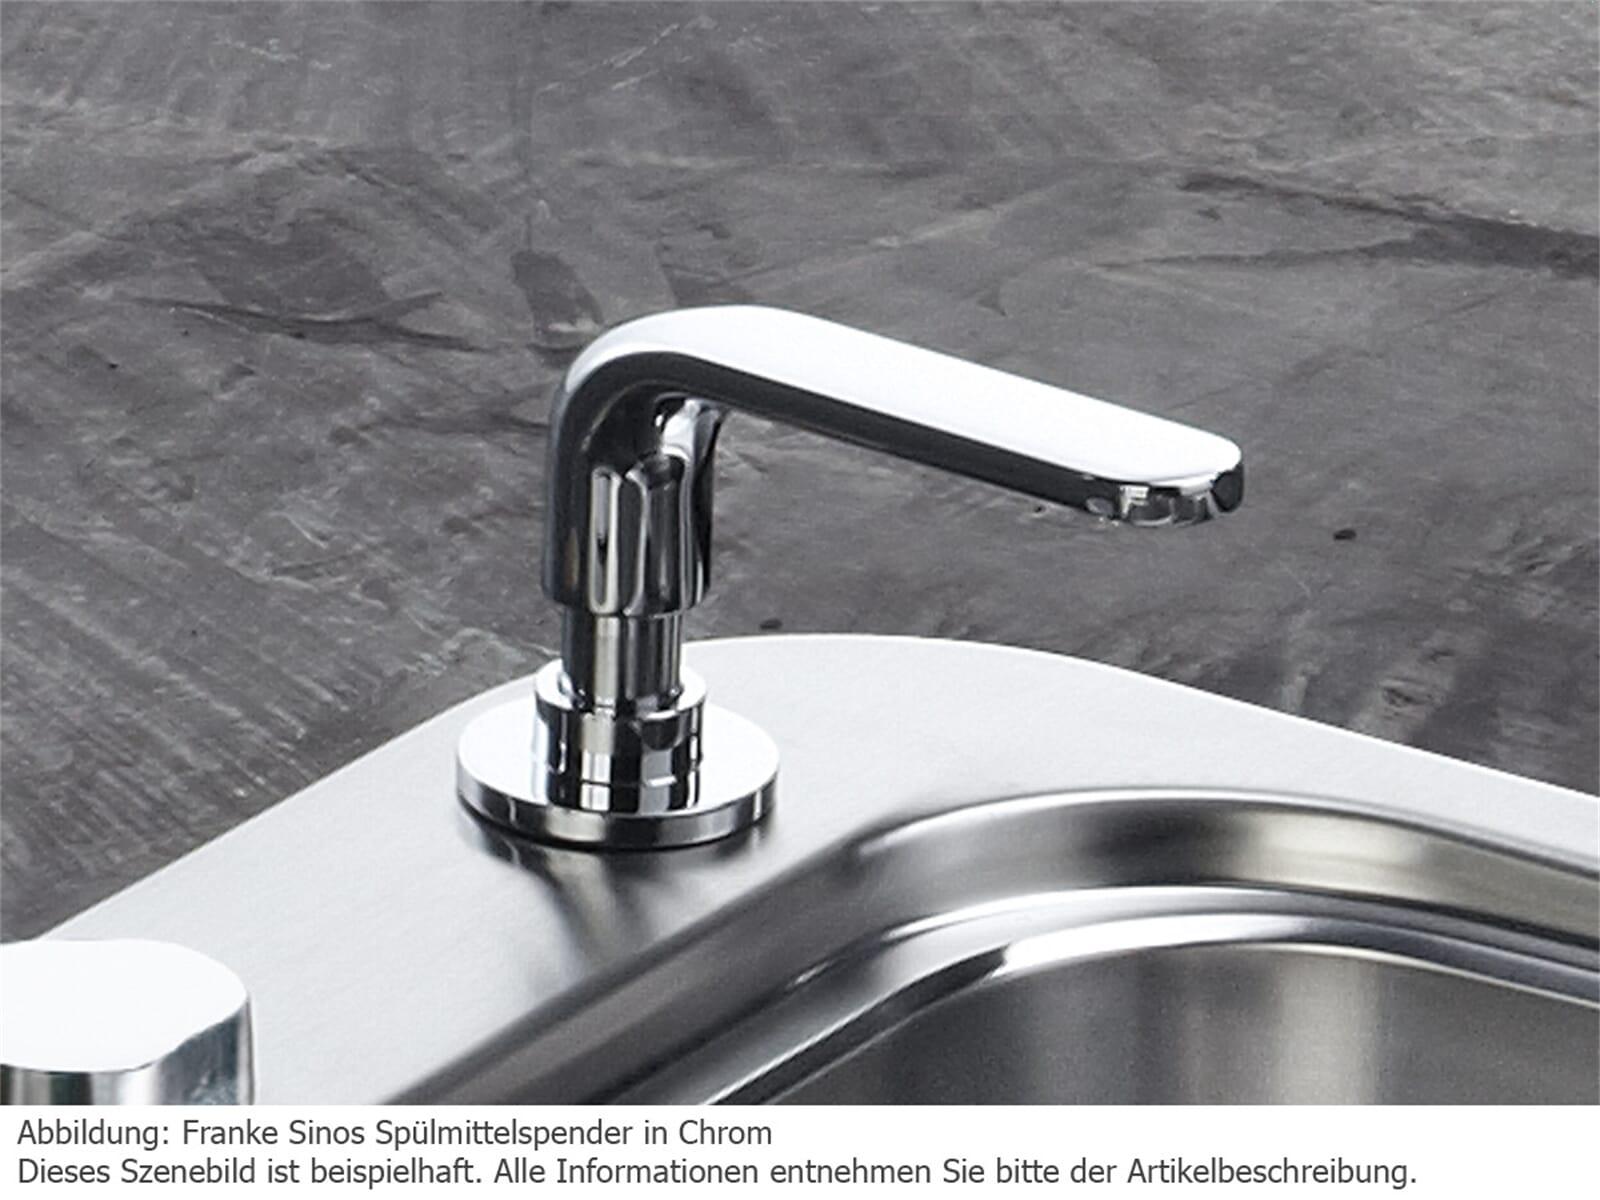 Franke Sinos Edelstahl-Optik Spülmittelspender